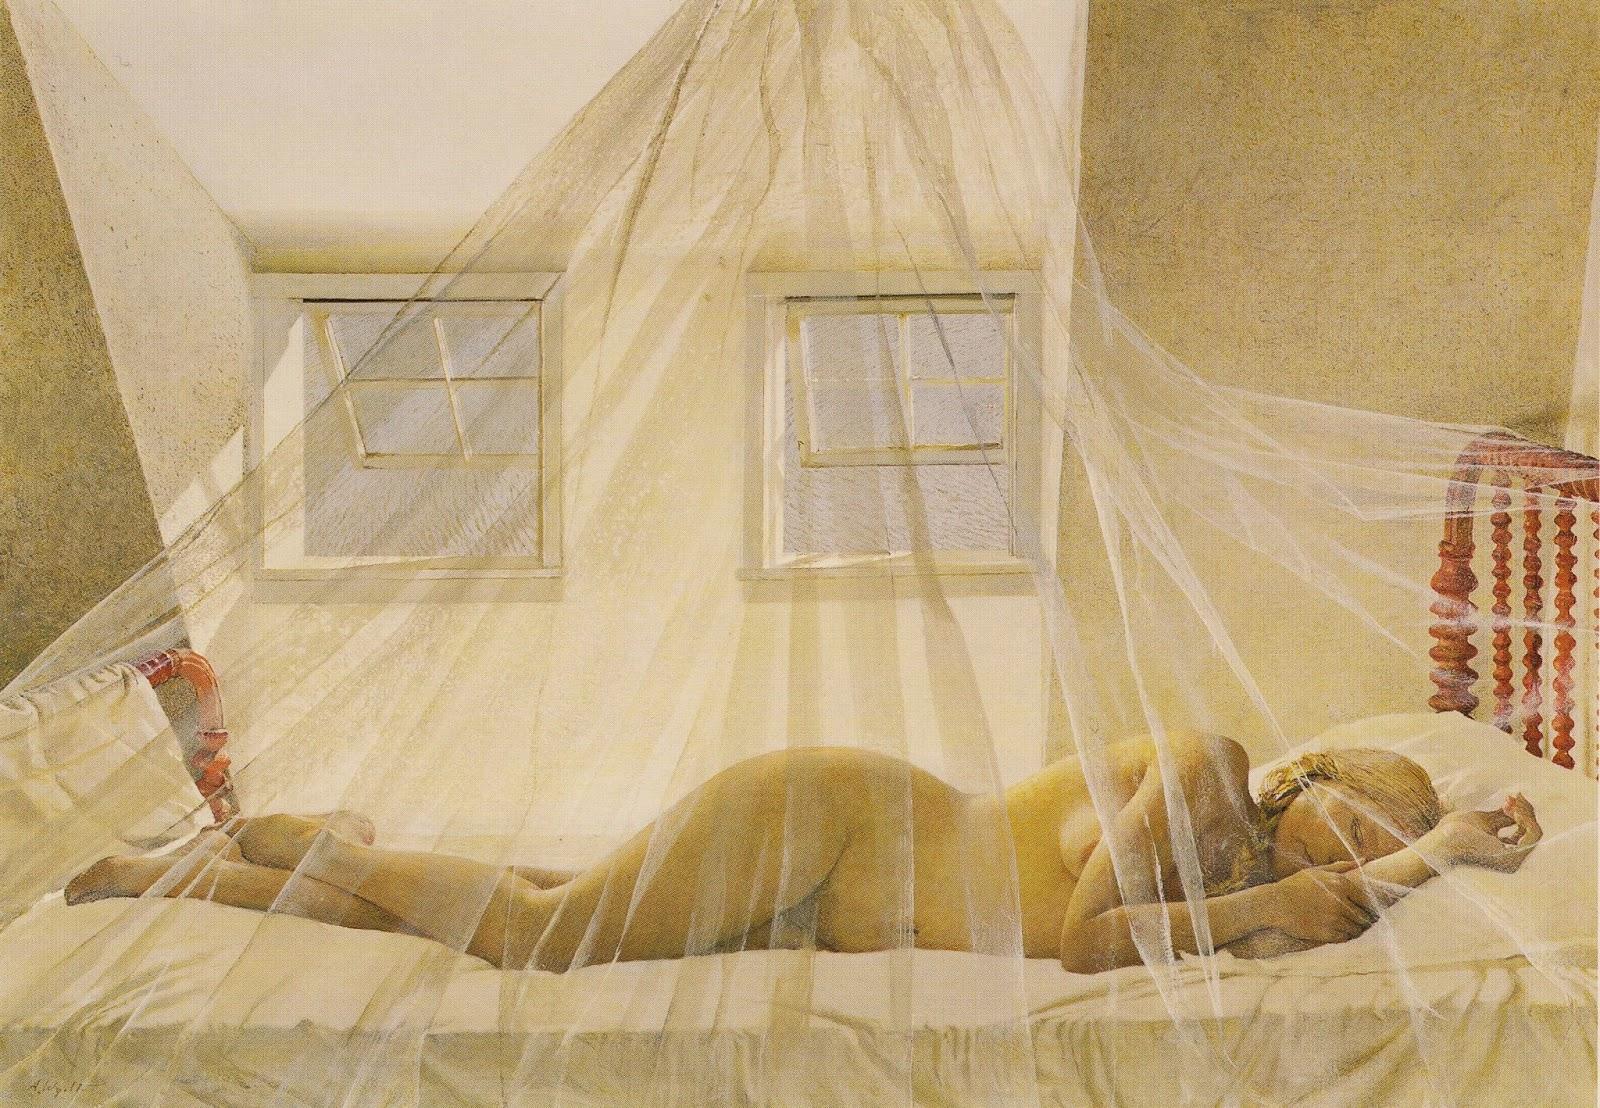 Andrew Wyeth Day Dream